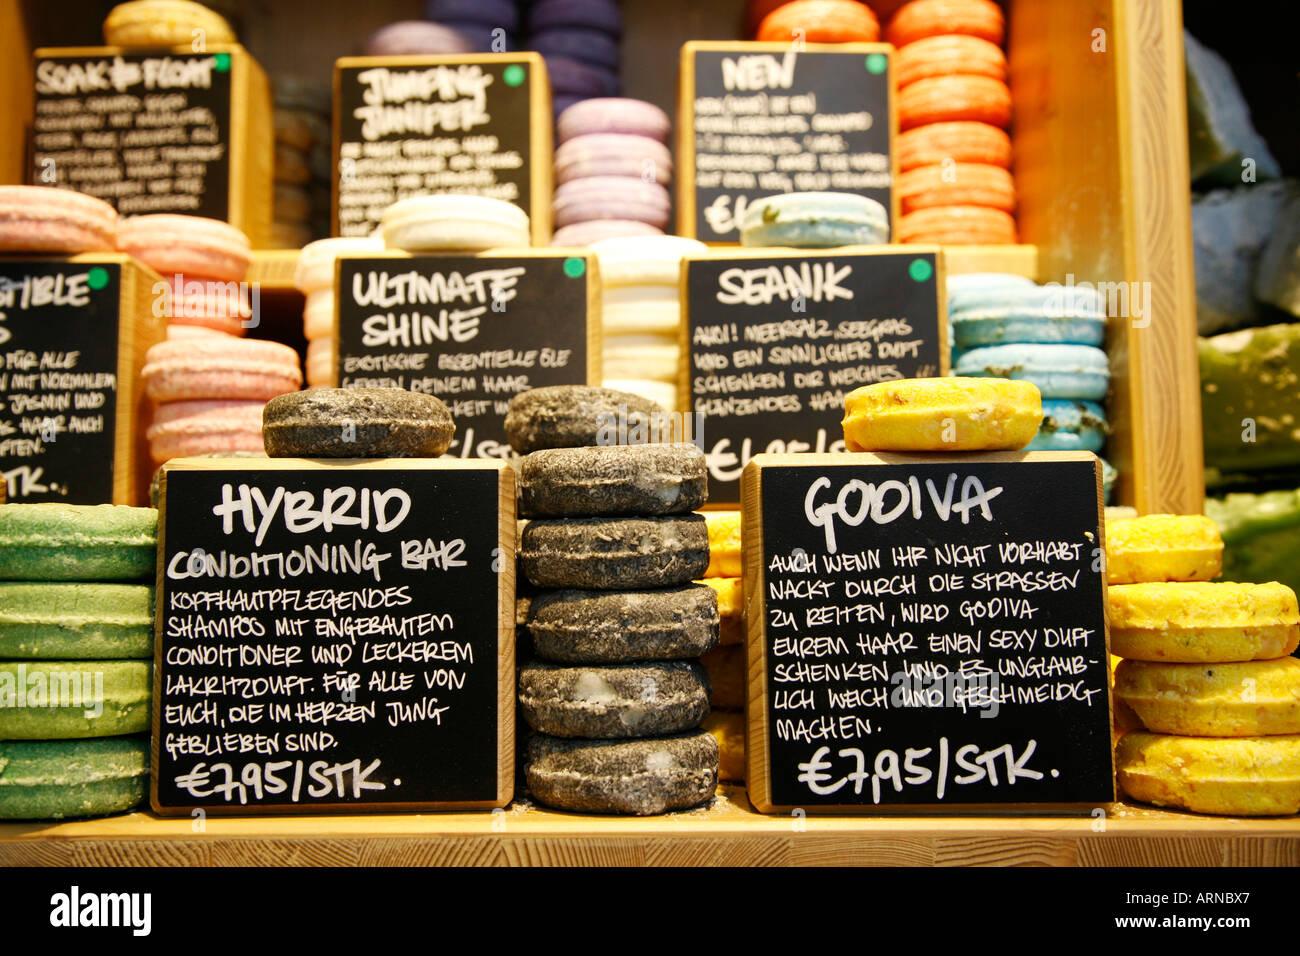 Soap shop handmade soaps Stock Photo: 9197030 - Alamy